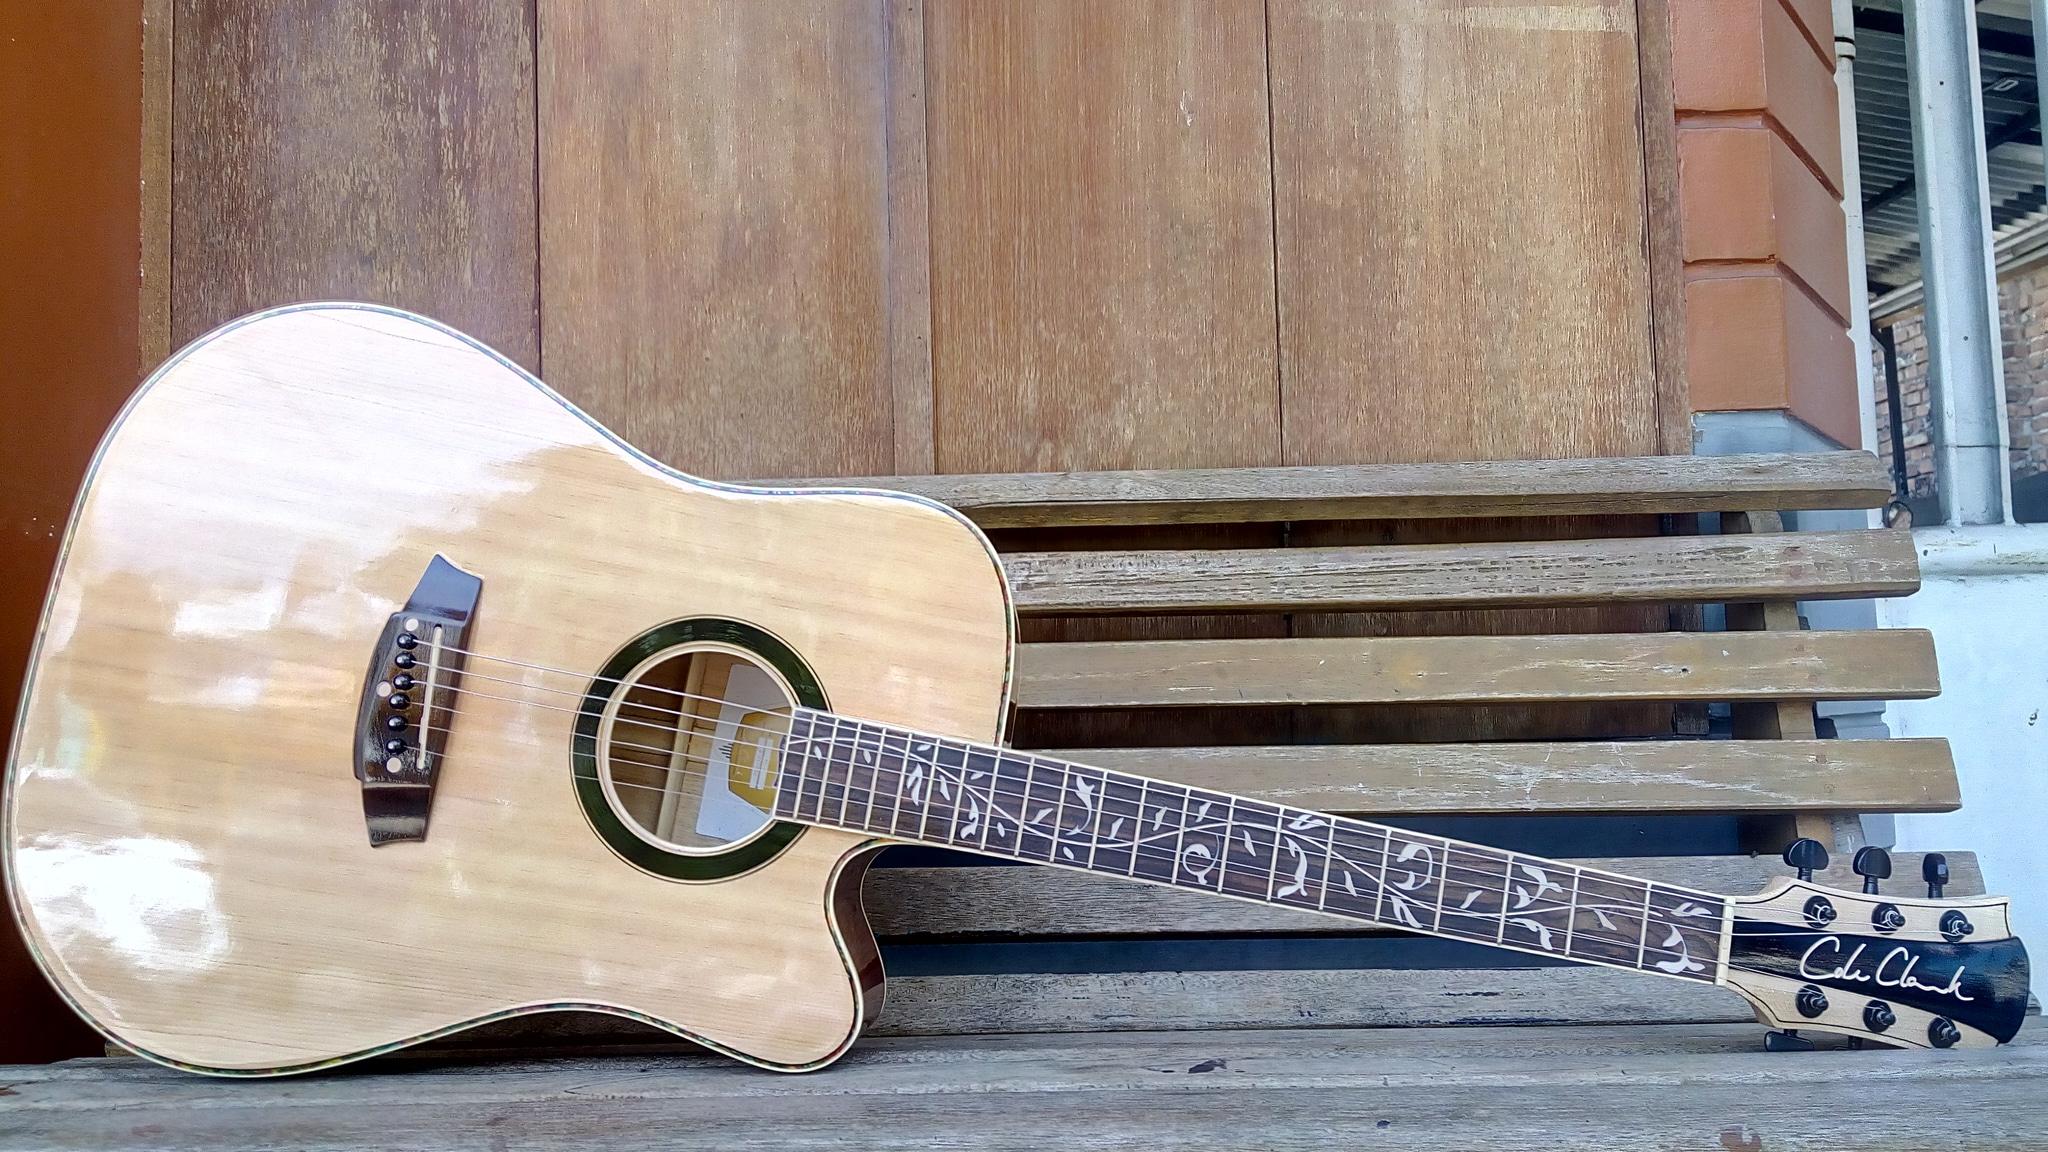 Jual Gitar Akustik Cole Clark Neck Maple Canada Garansi 1tahun Pick Kerang Toko Kondang Tokopedia